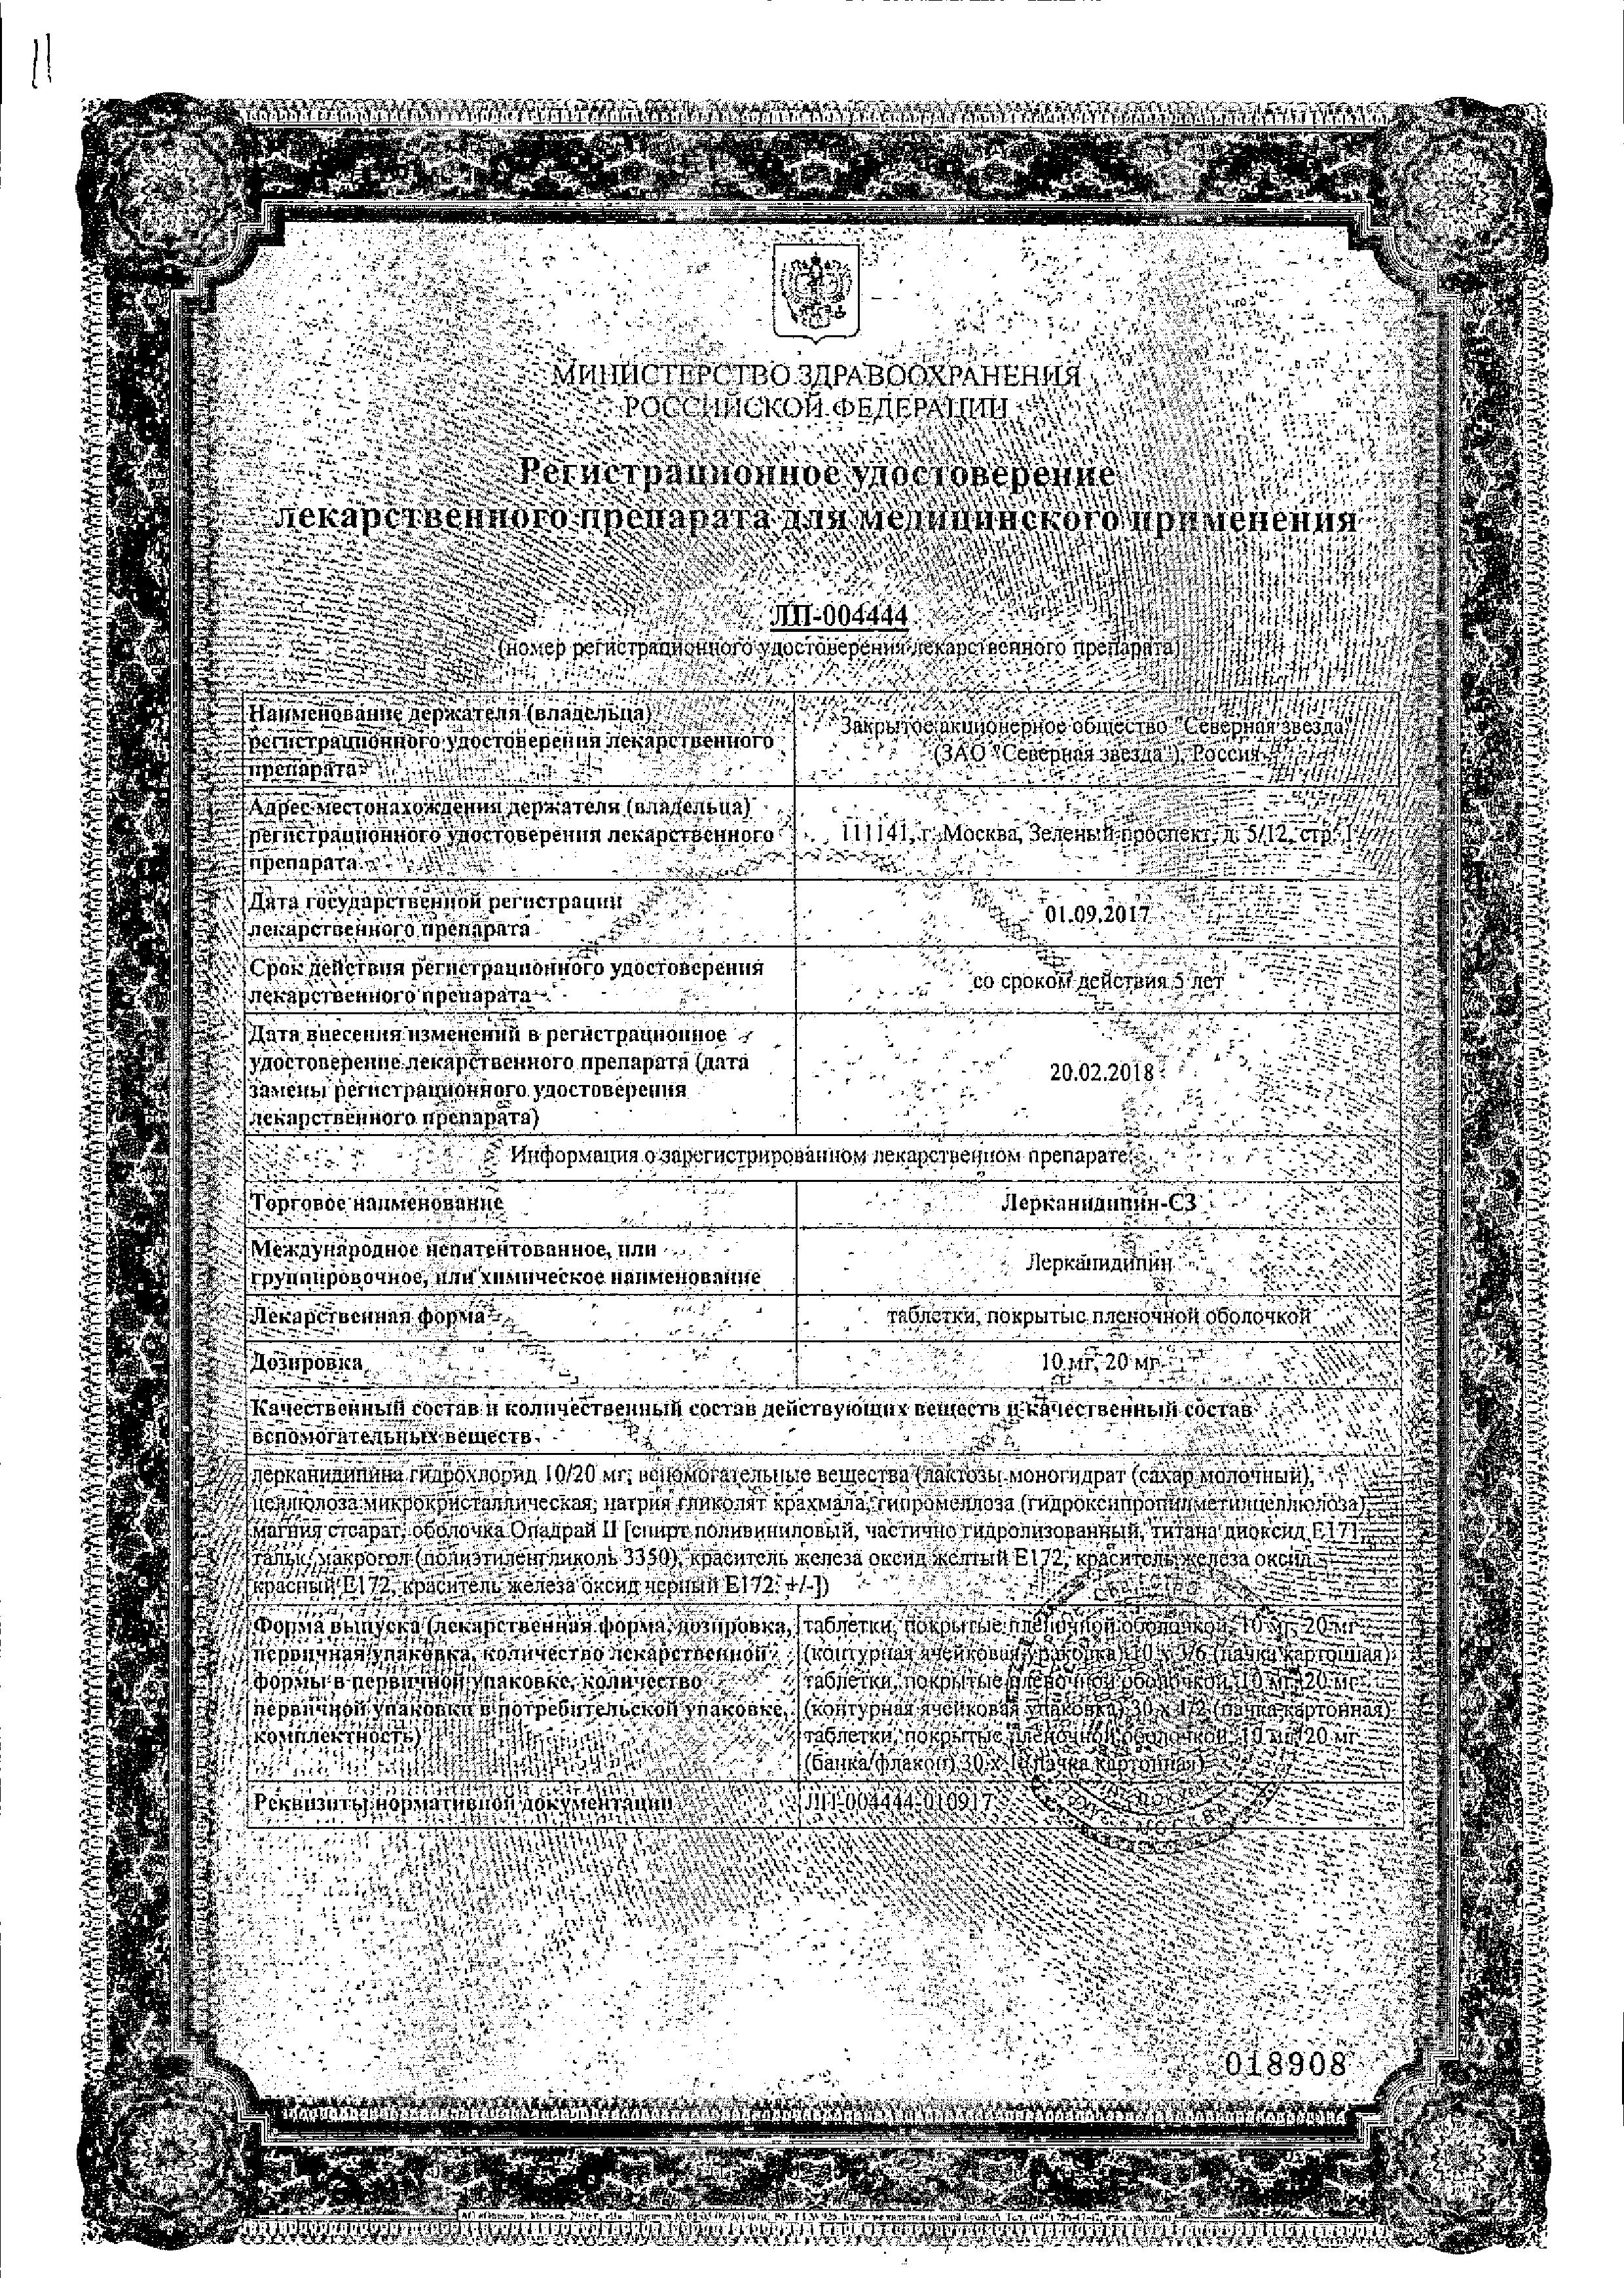 Лерканидипин-СЗ сертификат